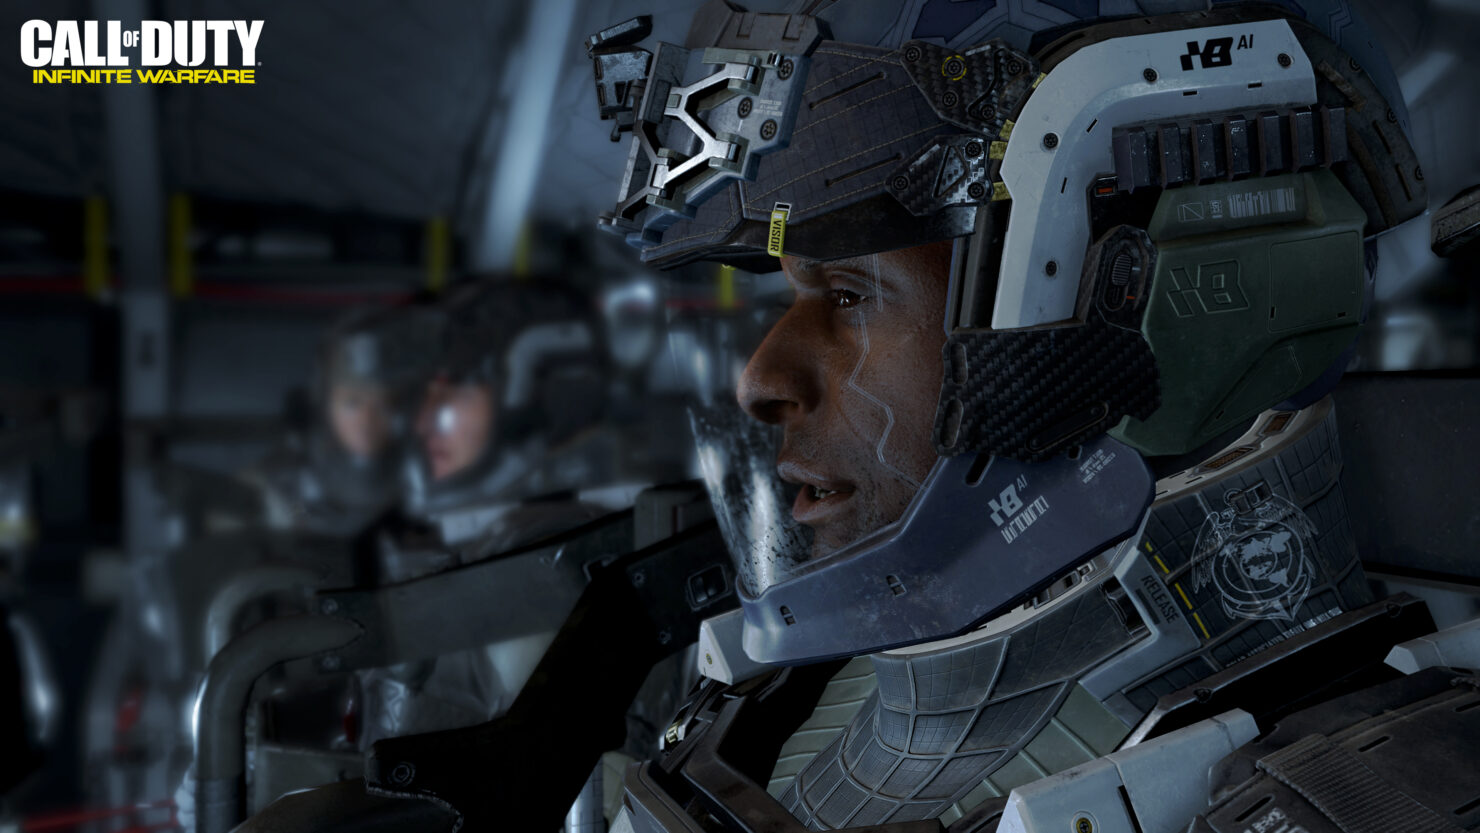 call_of_duty_infinite_warfare_4_wm_1462201114